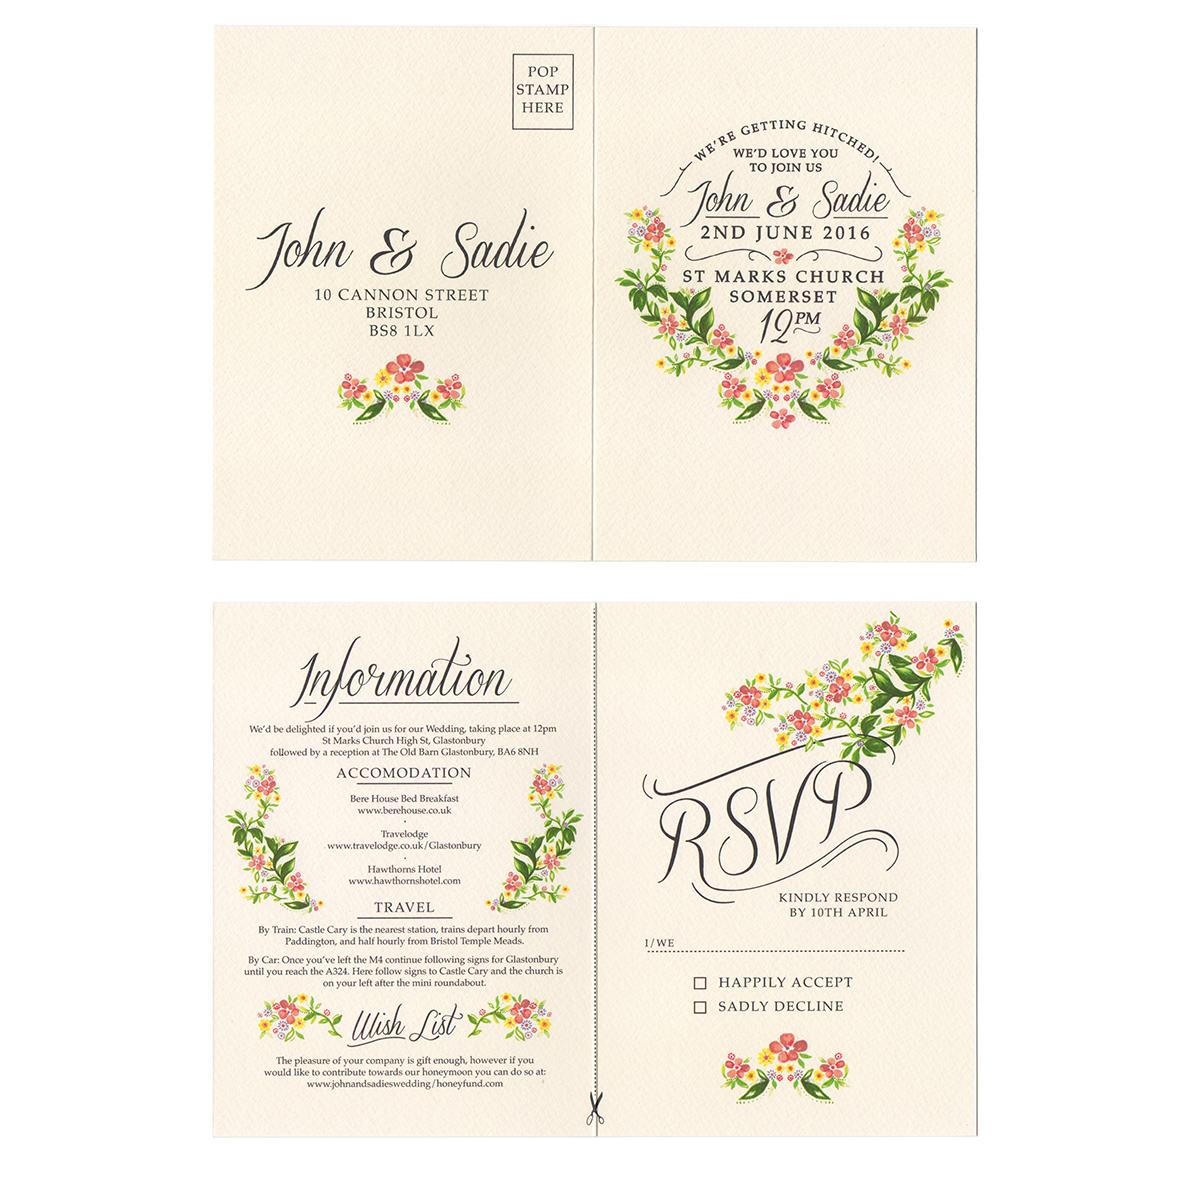 paperchase wedding invitations | Wedding